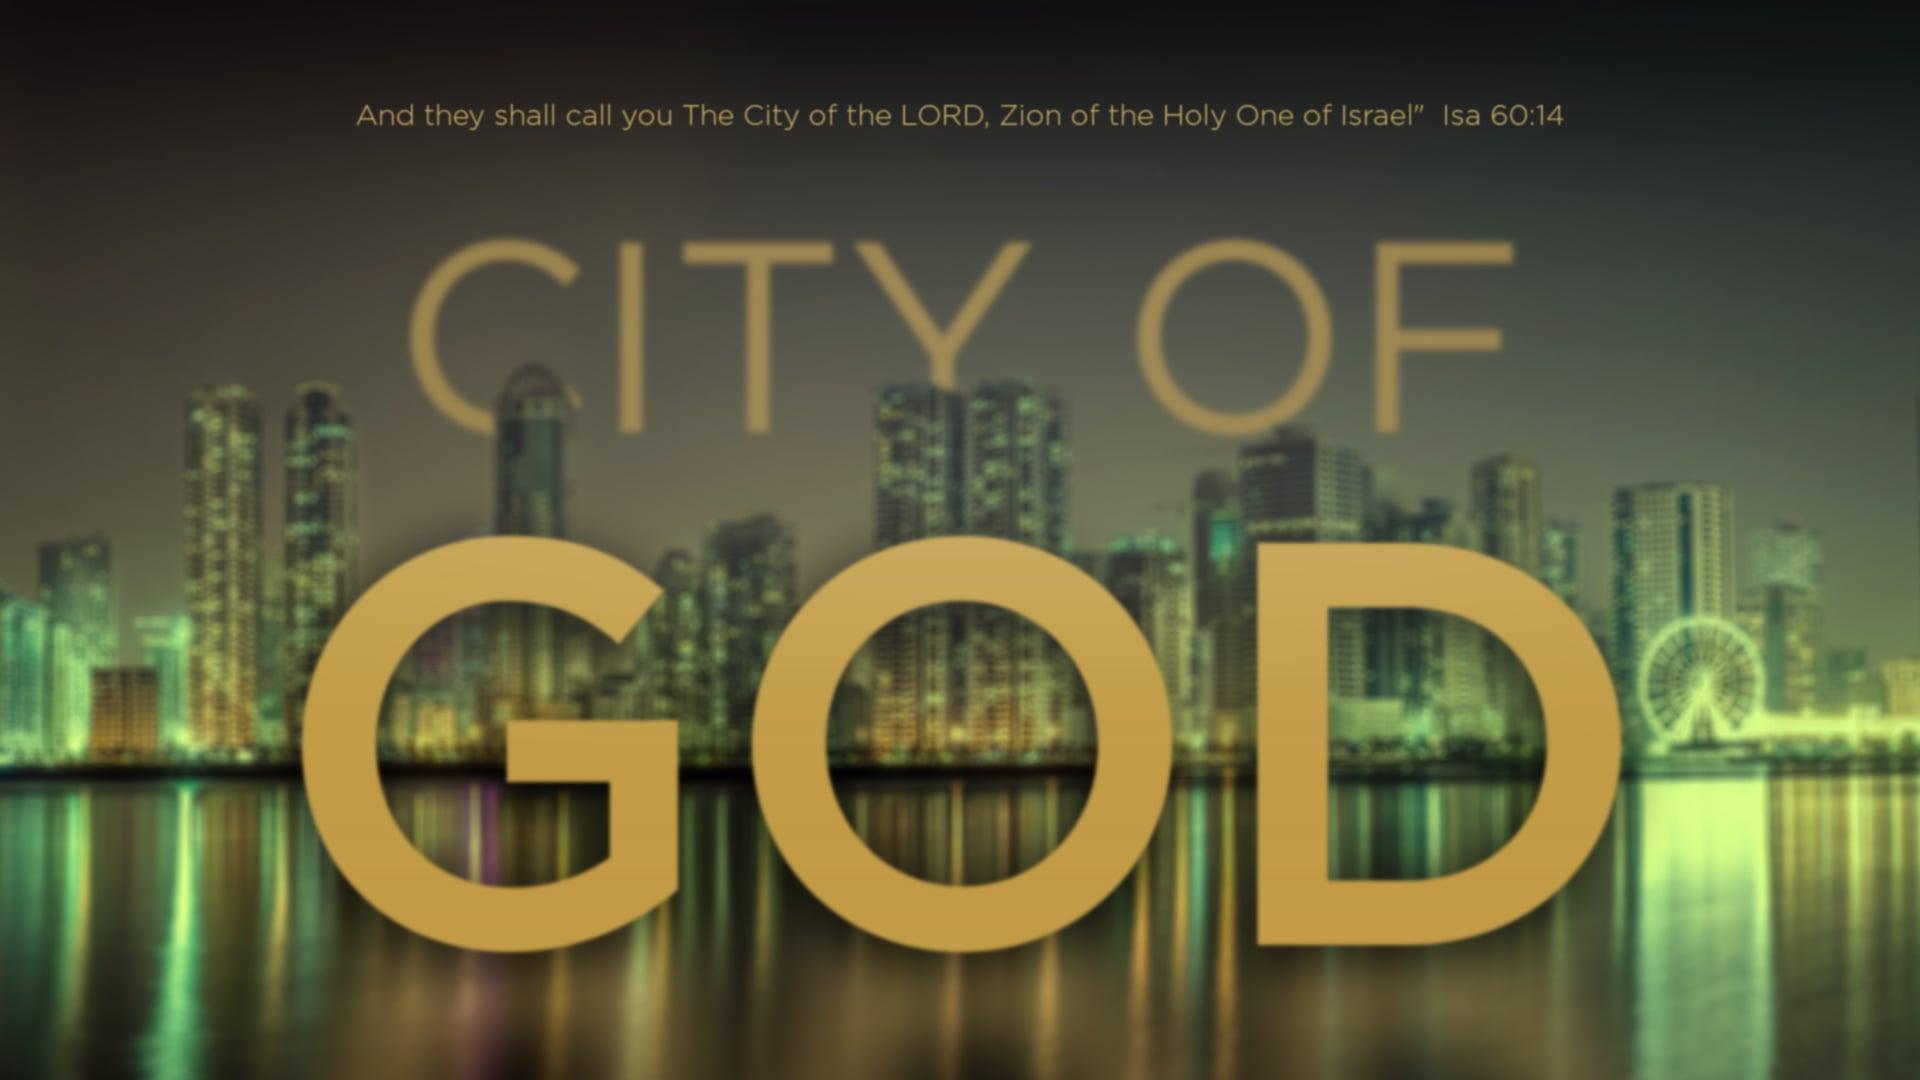 City of God - Part 4